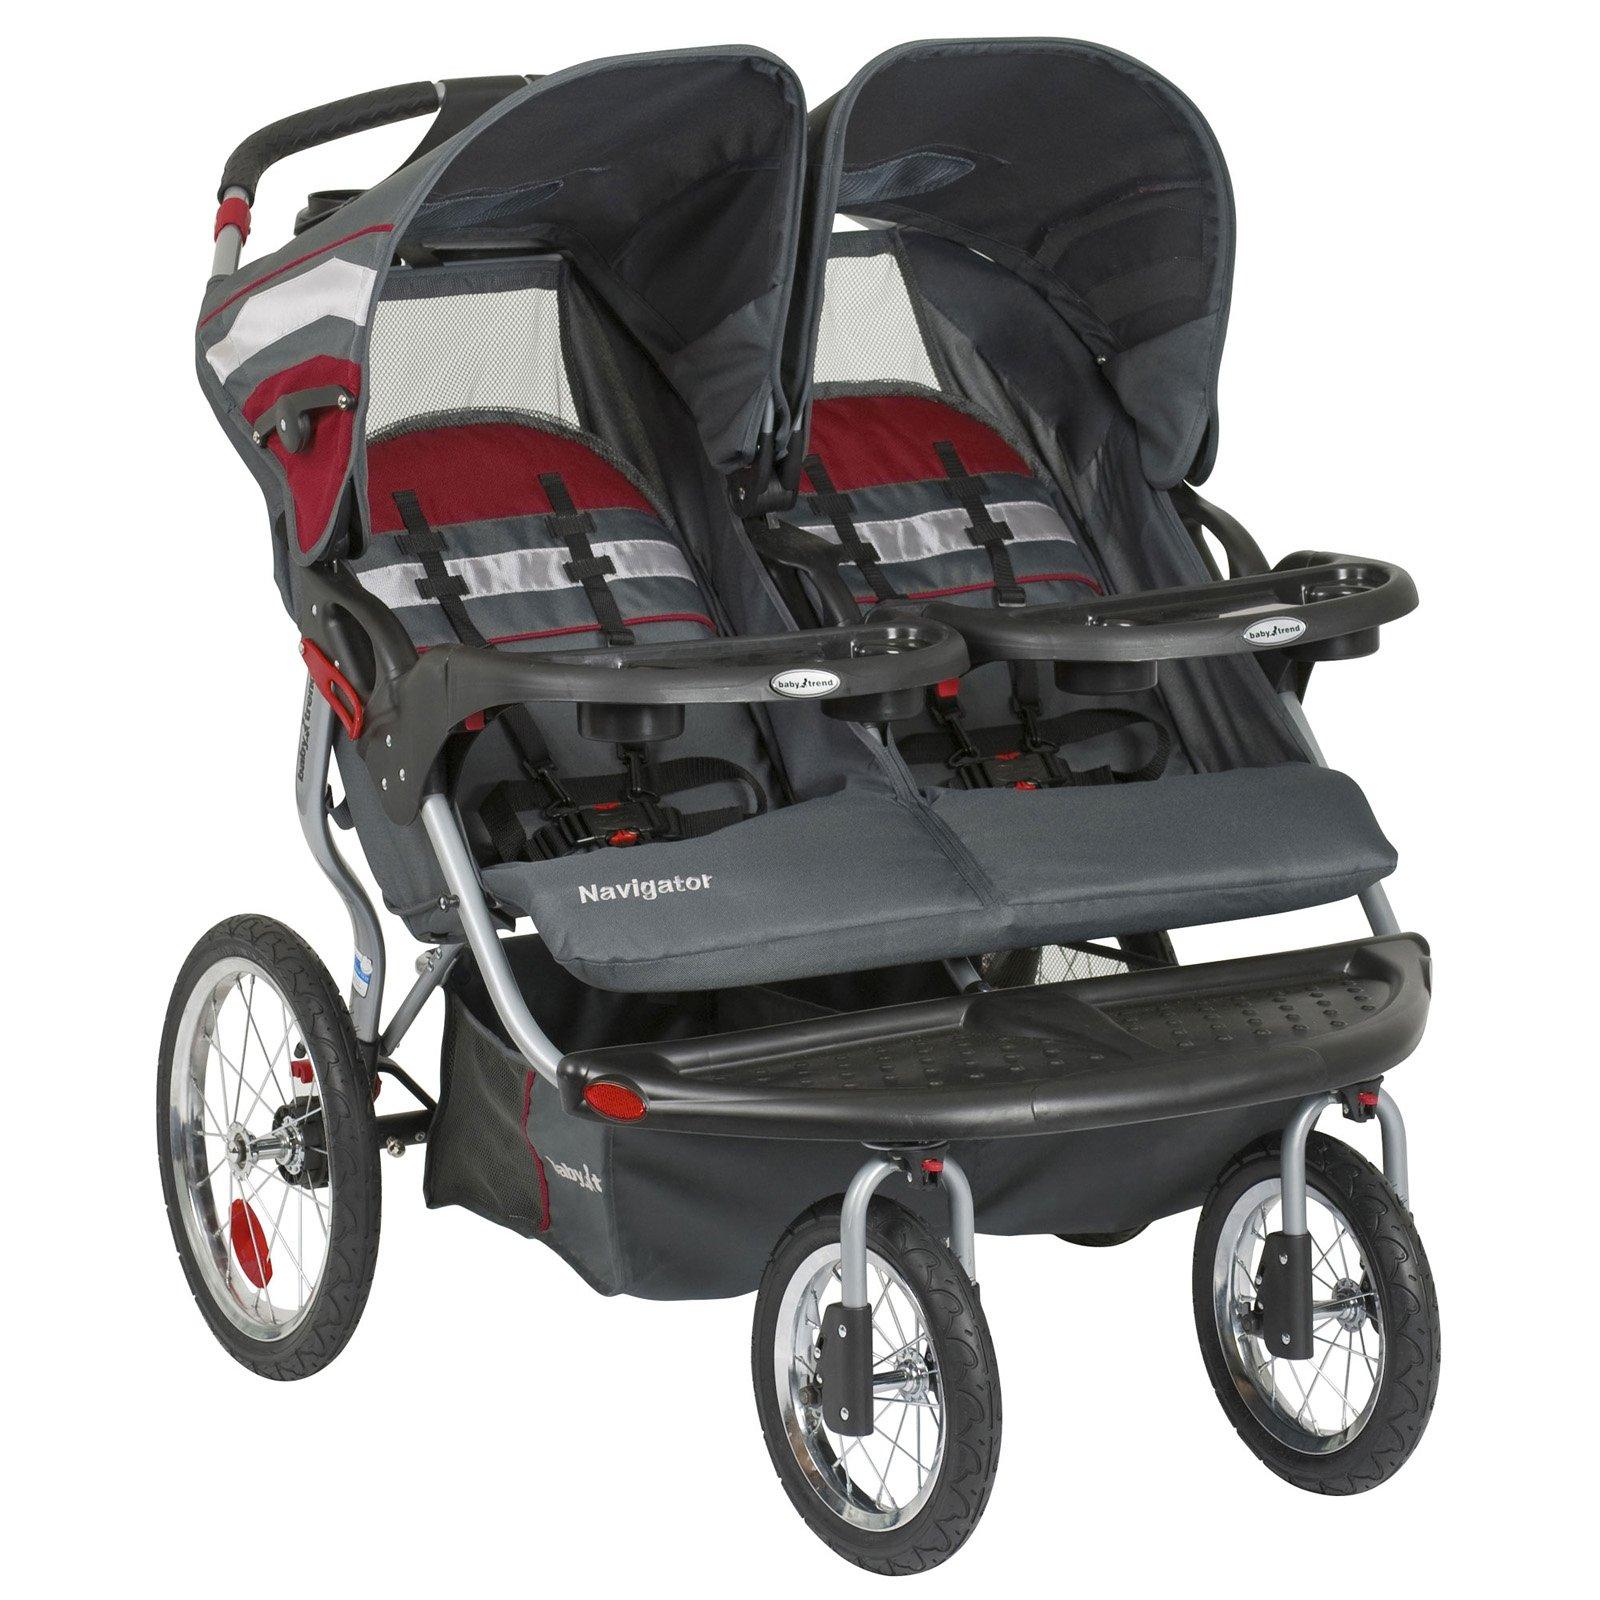 Baby Trend Navigator Double Jogger Stroller - Baltic